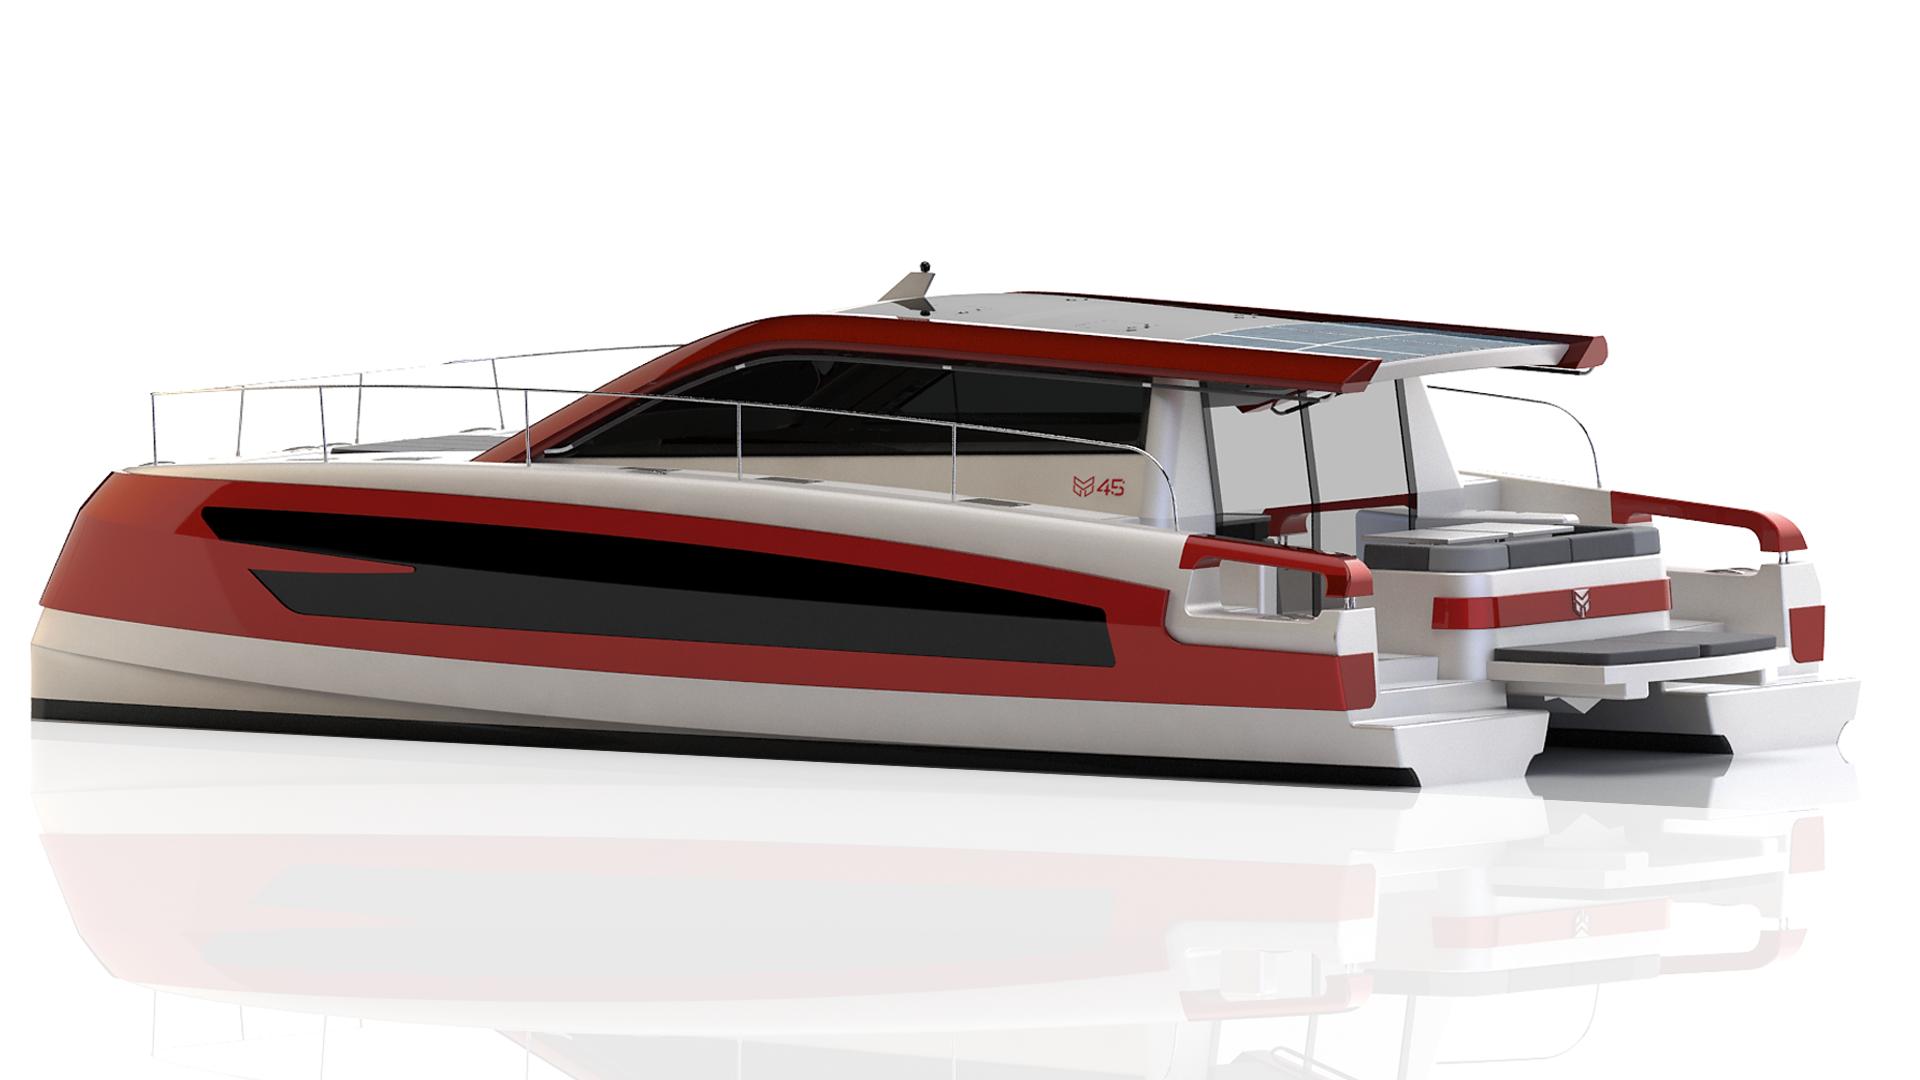 Makai Yachts